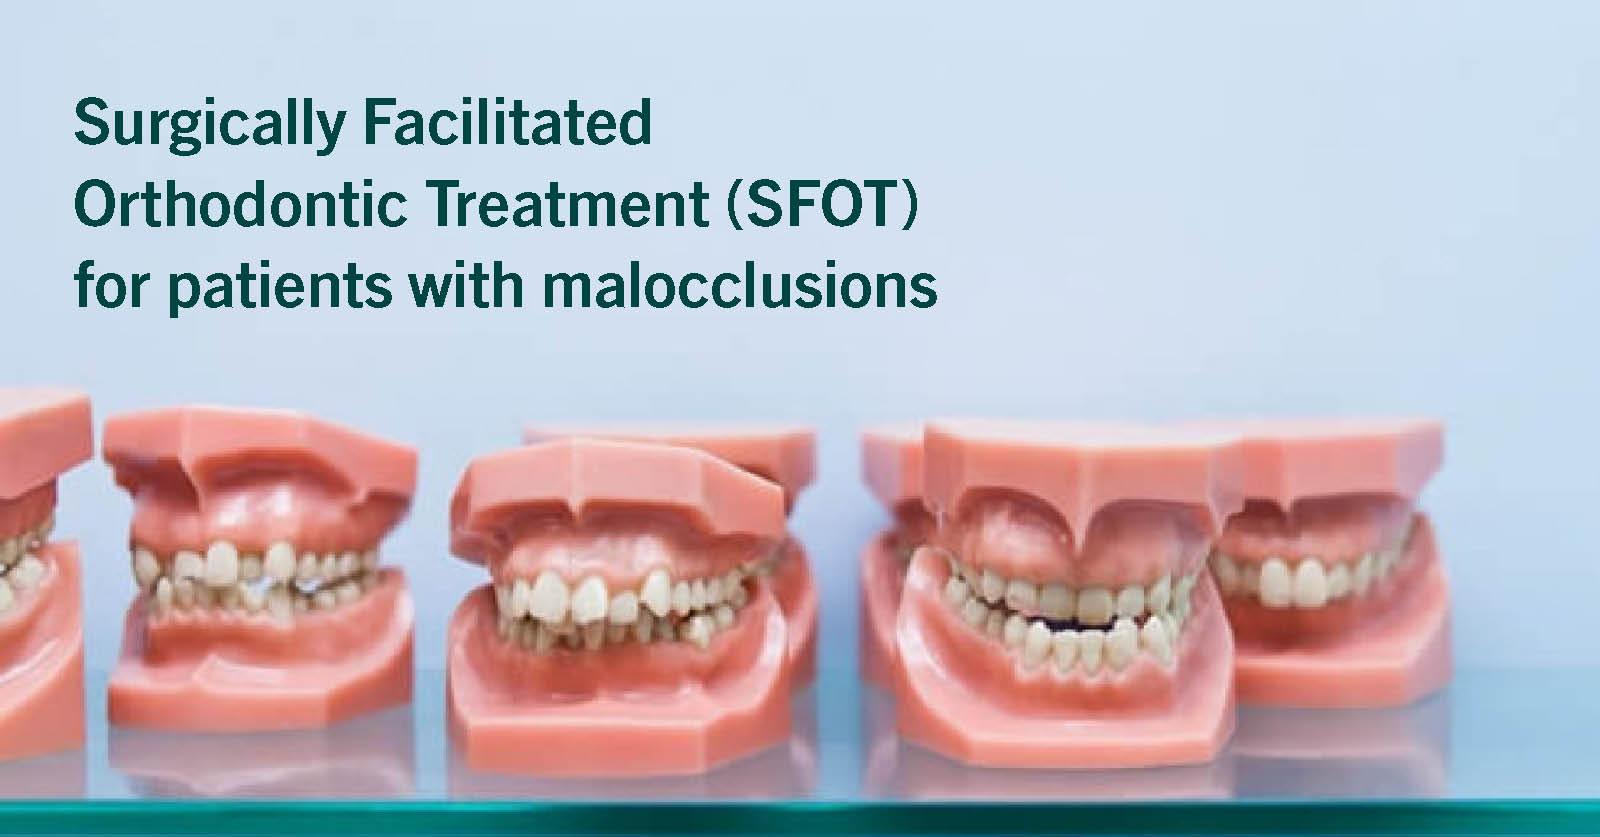 Surgically Facilitated Orthodontic Treatment (SFOT)